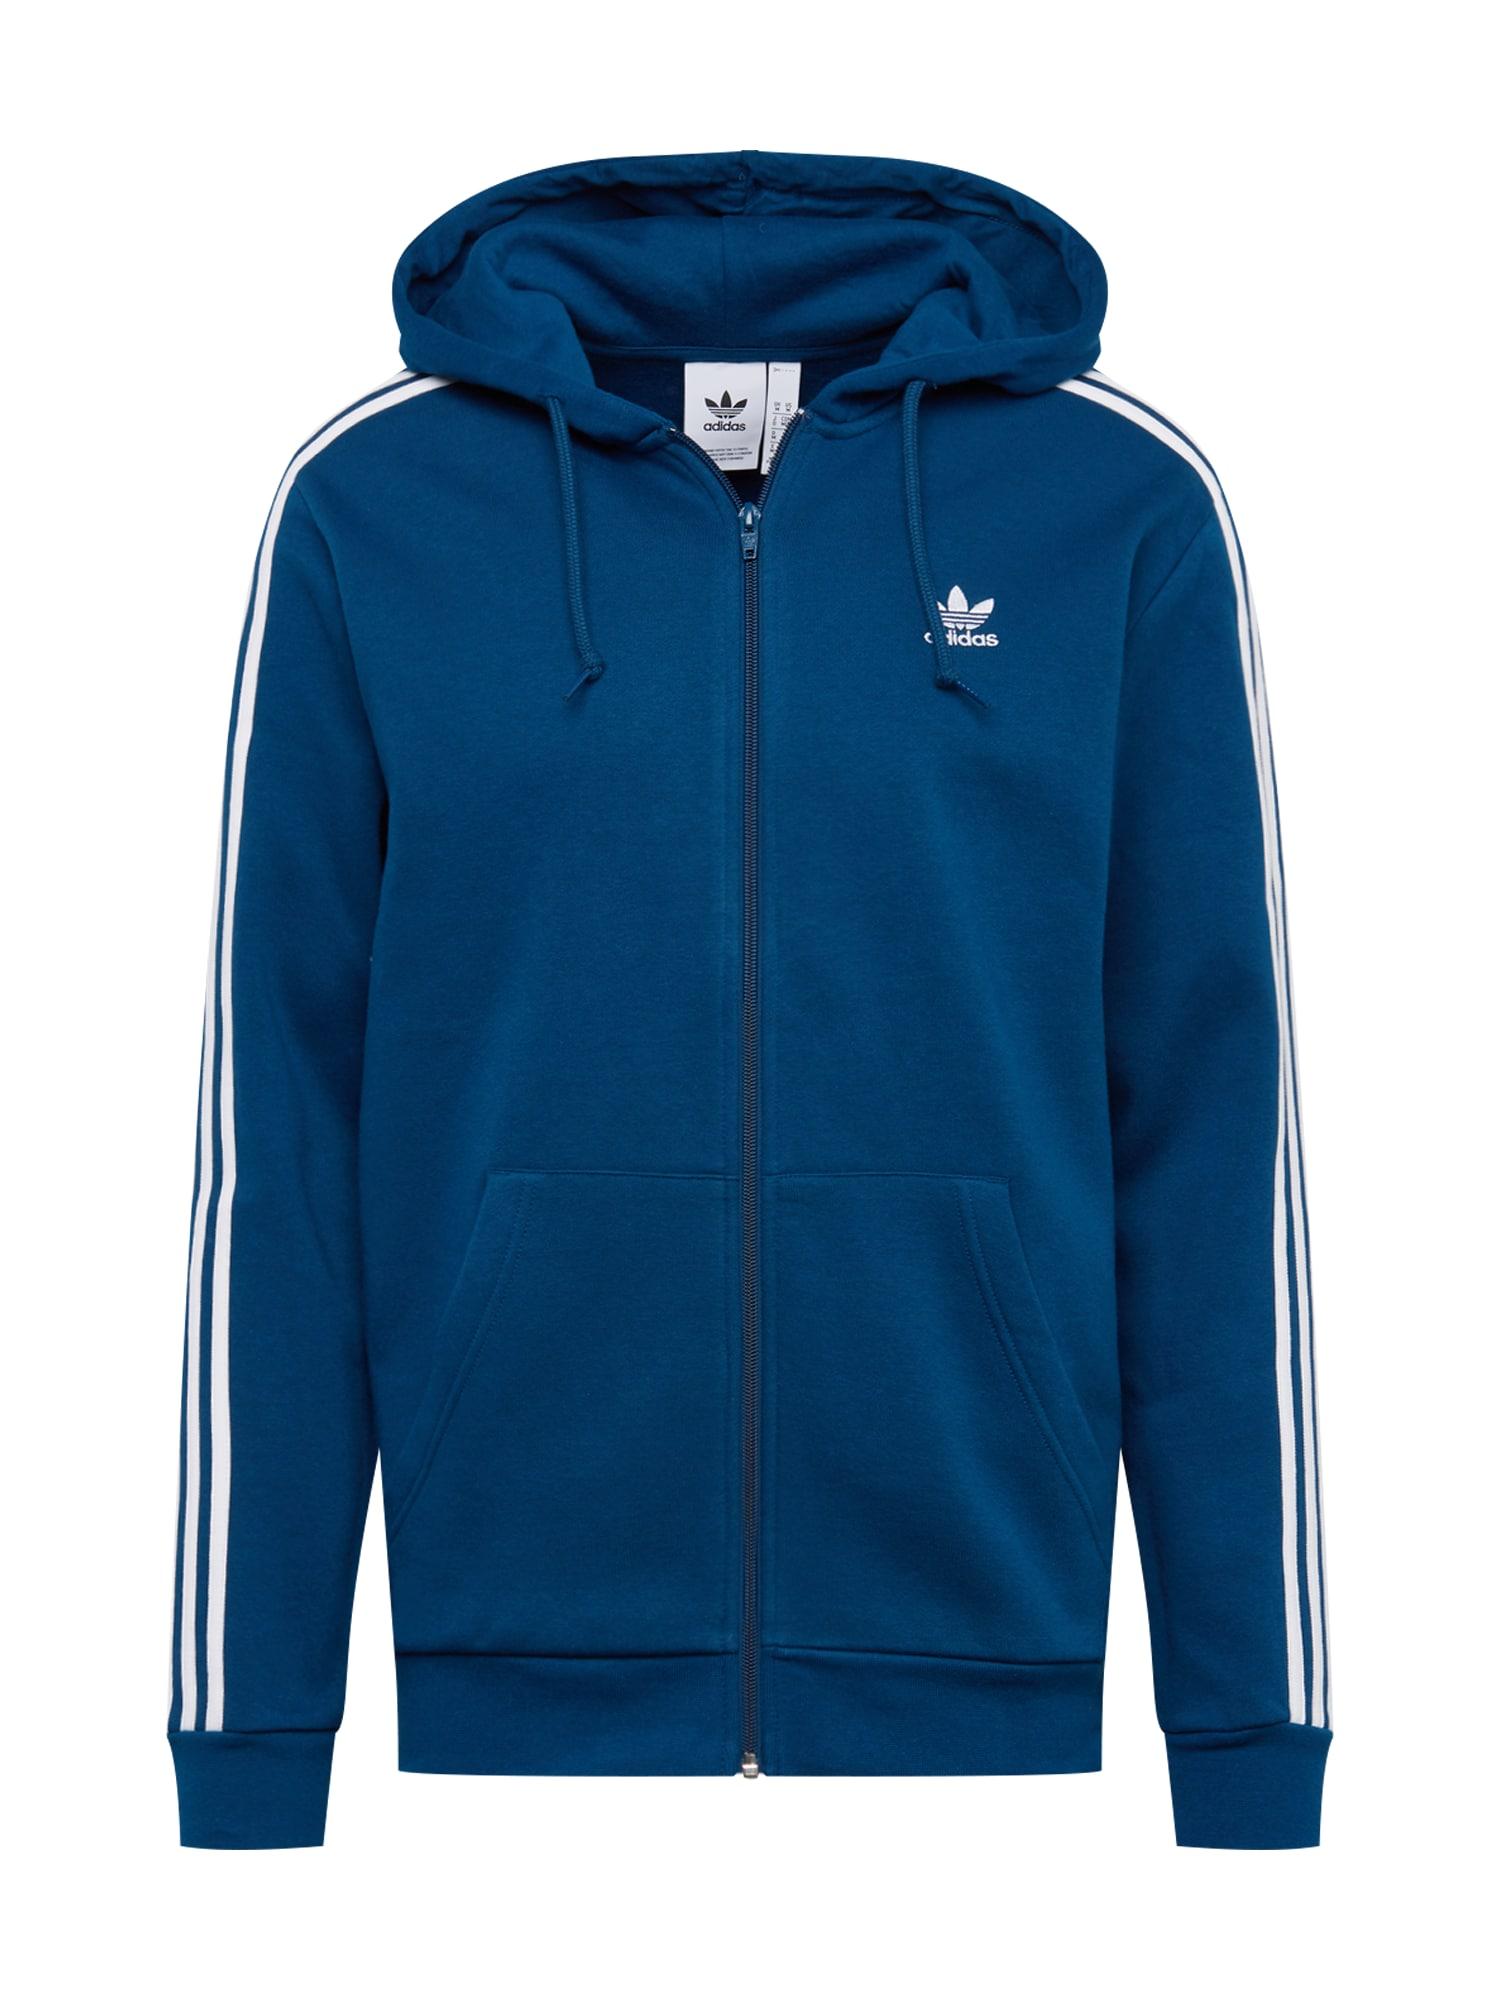 Mikina s kapucí 3-STRIPES FZ marine modrá bílá ADIDAS ORIGINALS